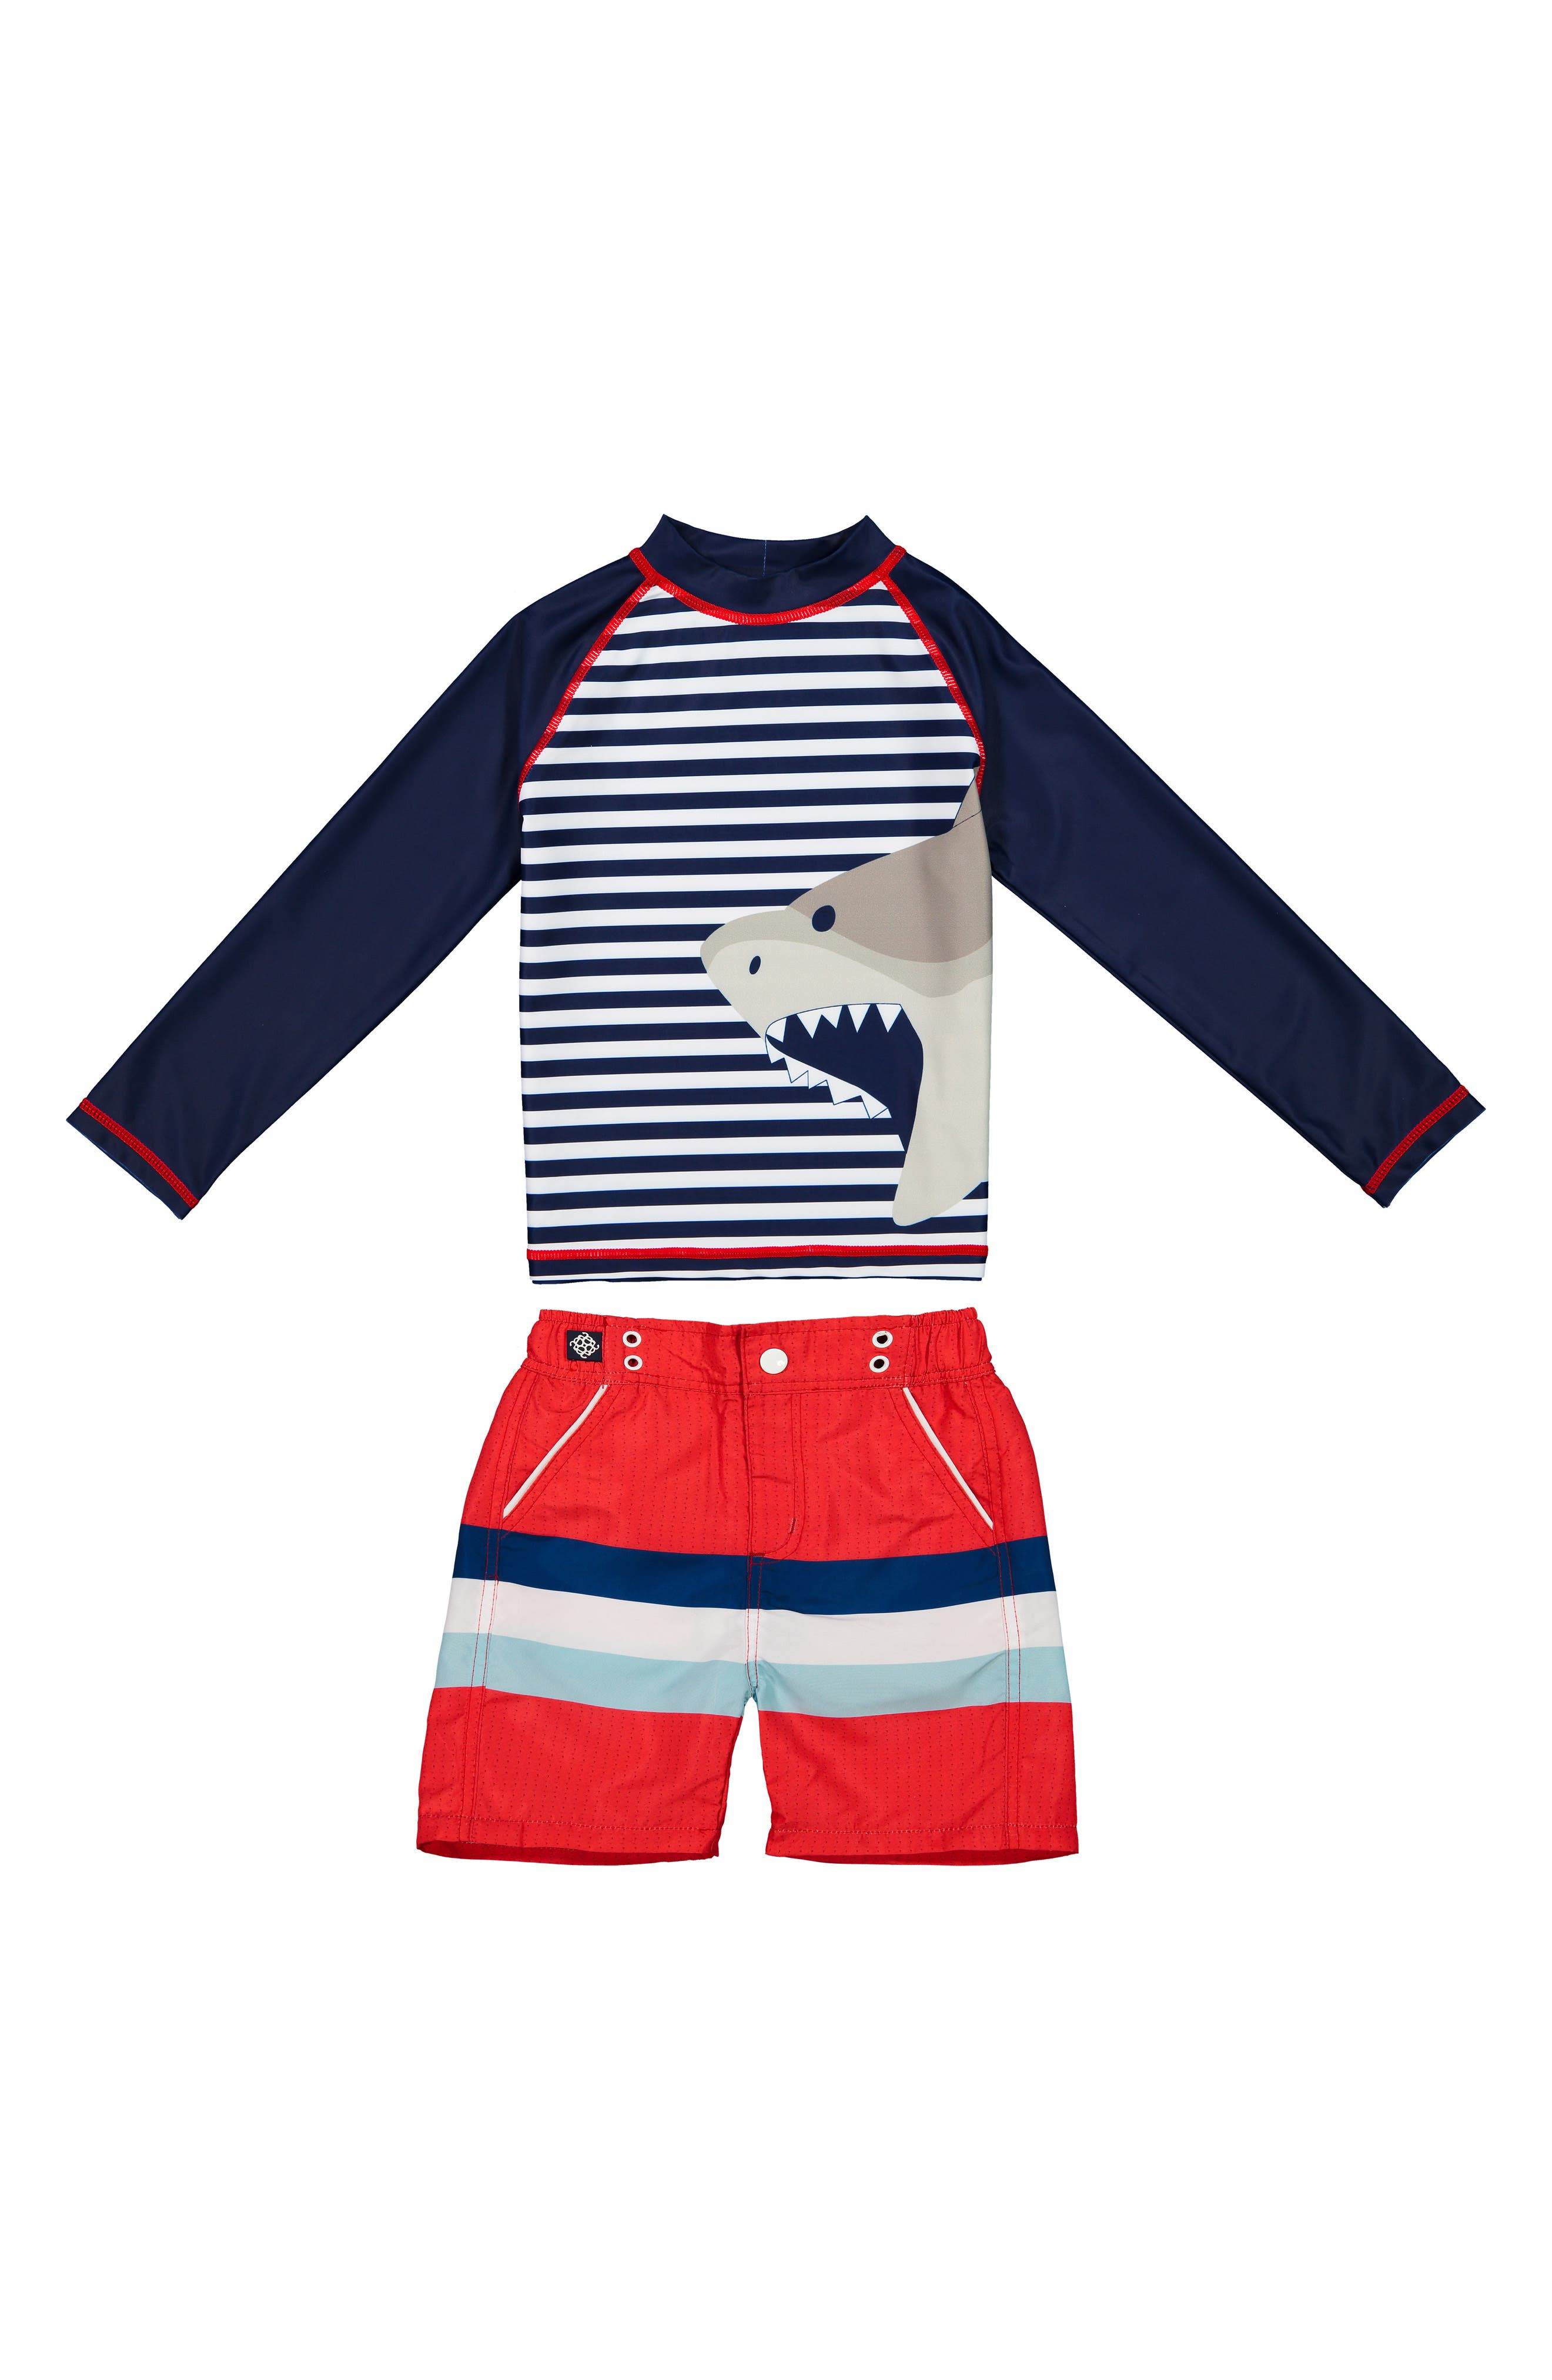 Toddler /& Boys 50 UPF Protection Rashguard Top or Set Andy /& Evan Infant